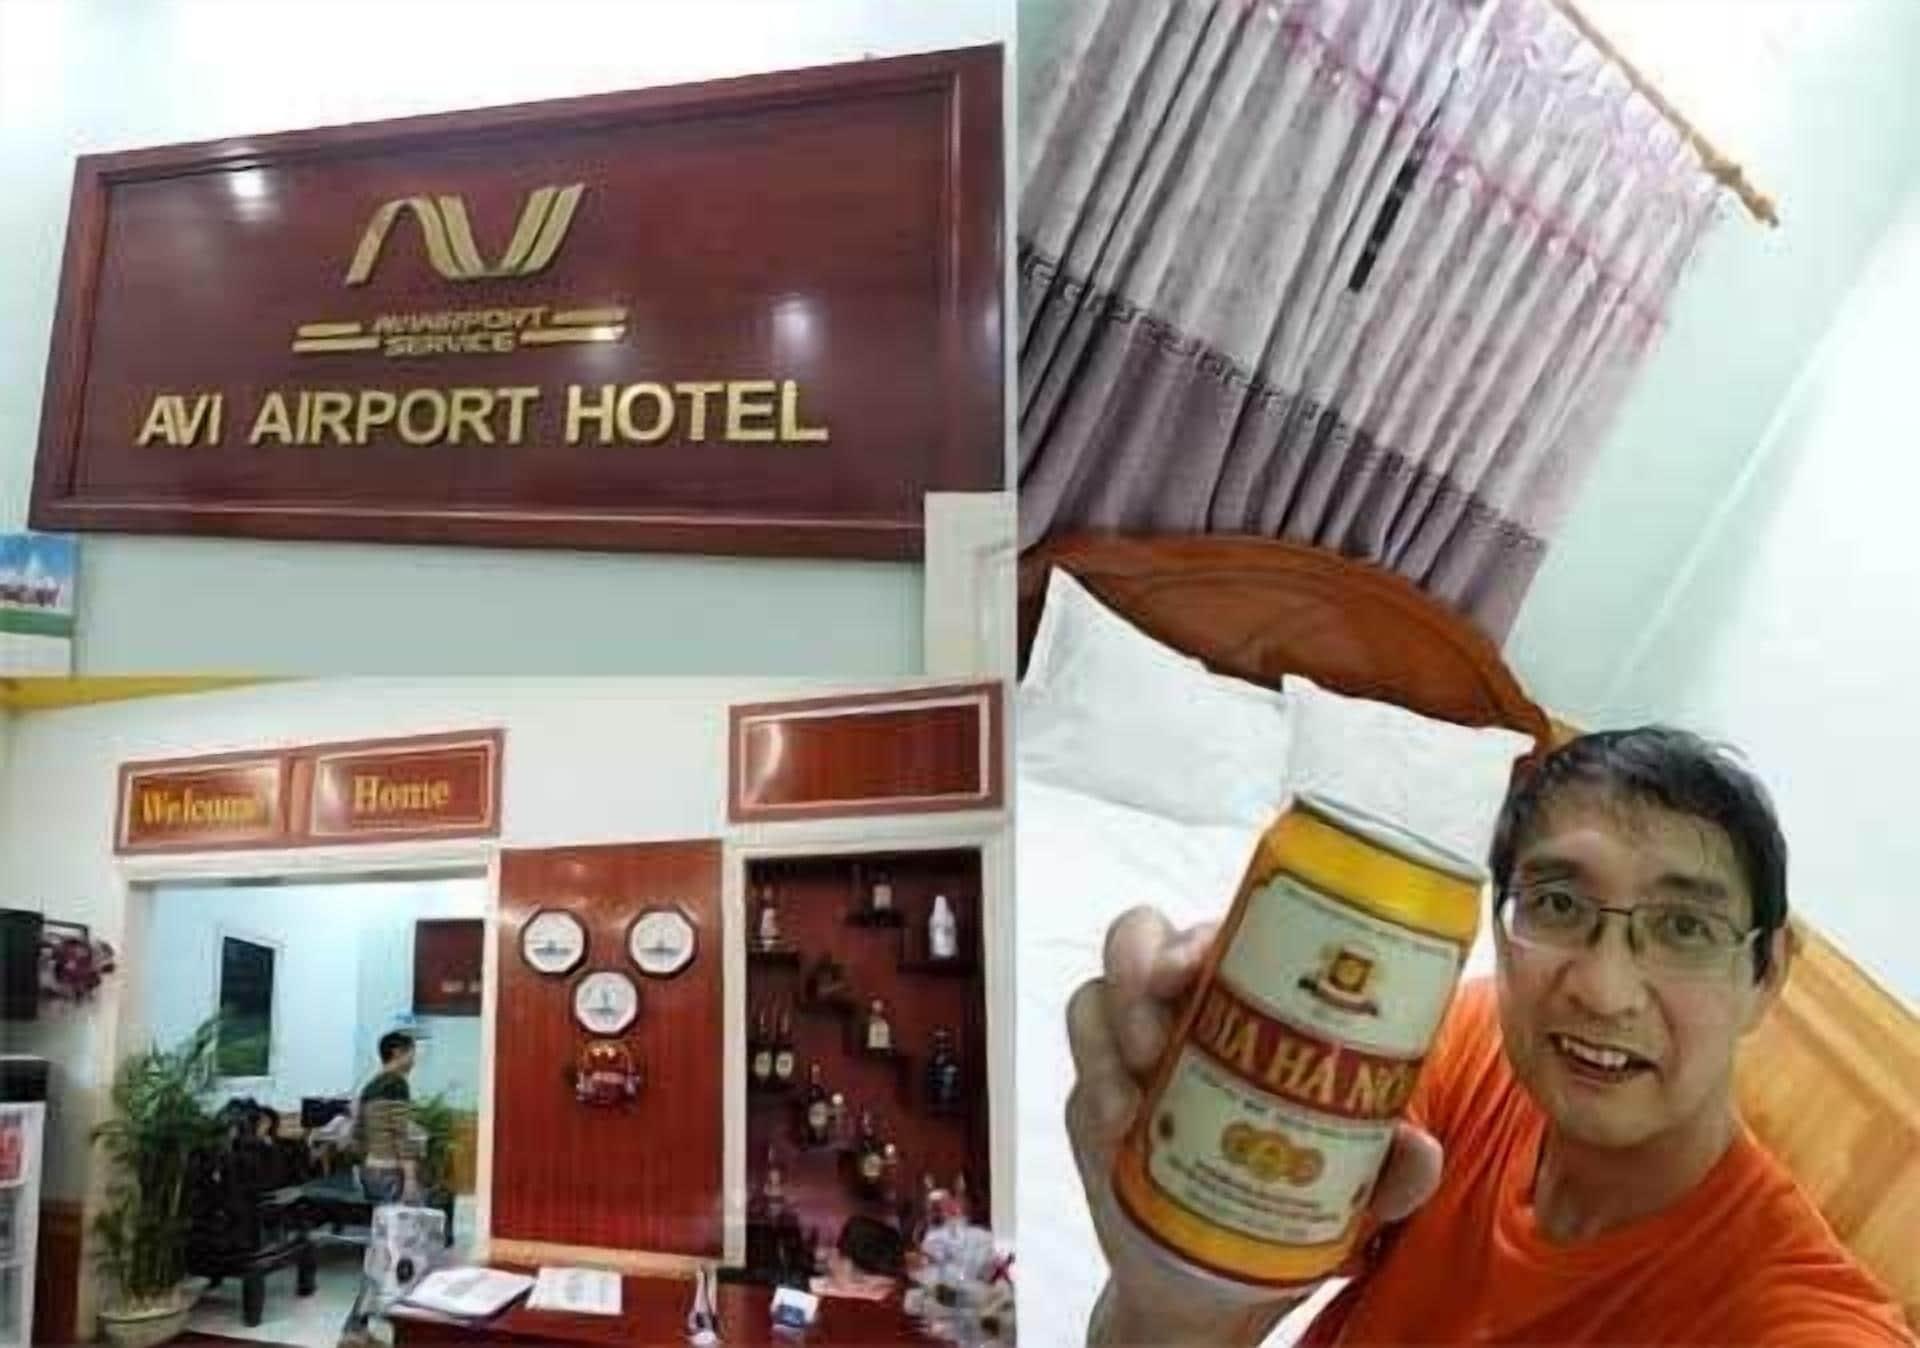 Avi Airport Hotel, Sóc Sơn